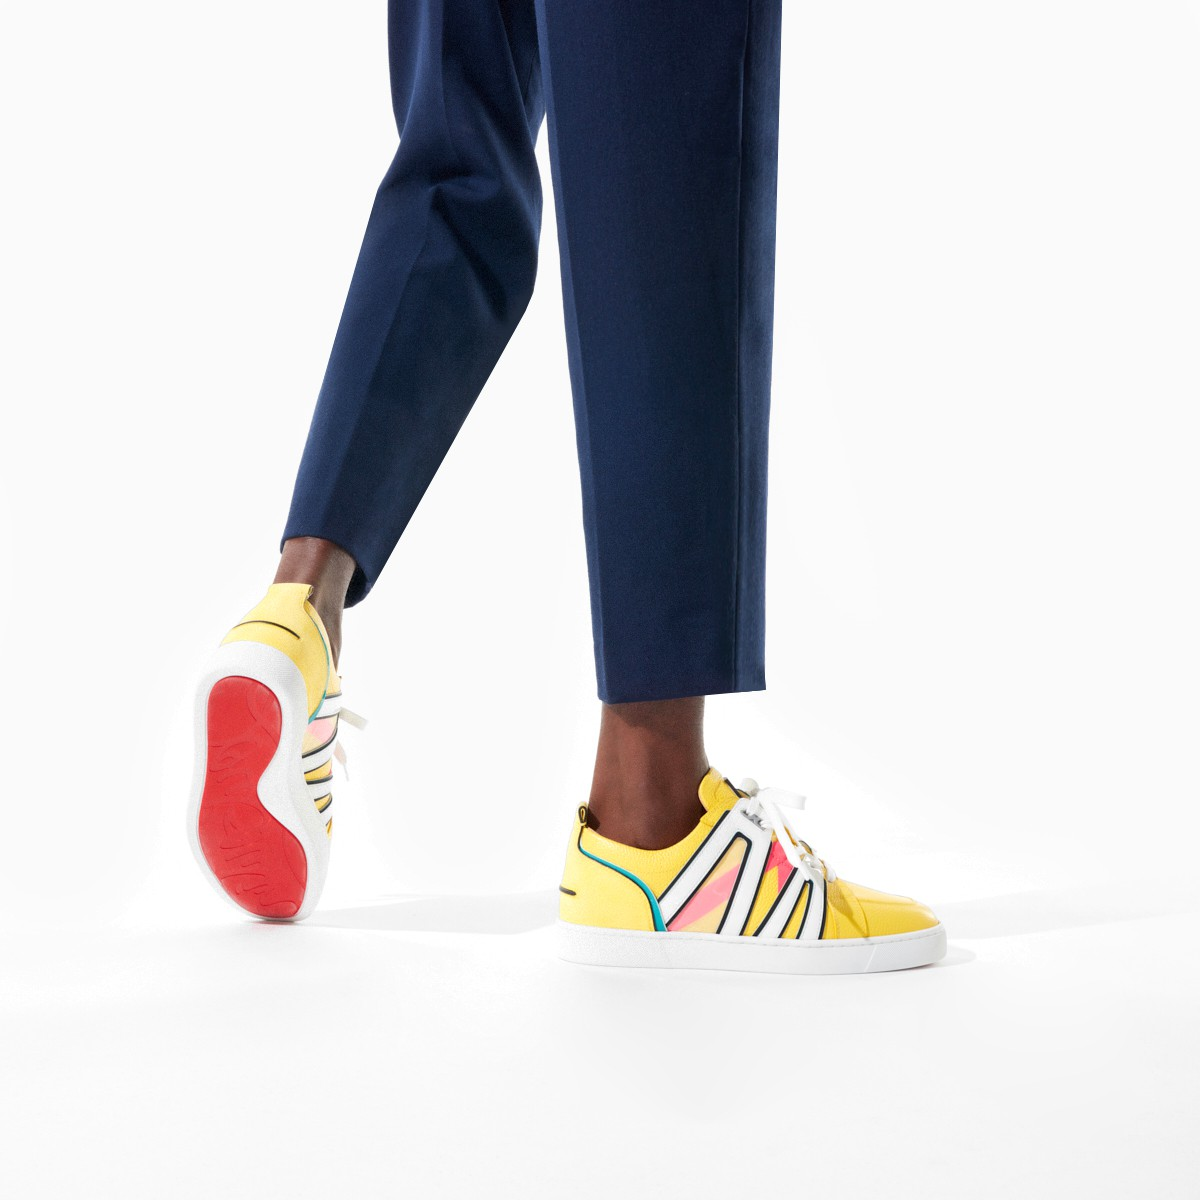 Shoes - Vida Viva Flat - Christian Louboutin